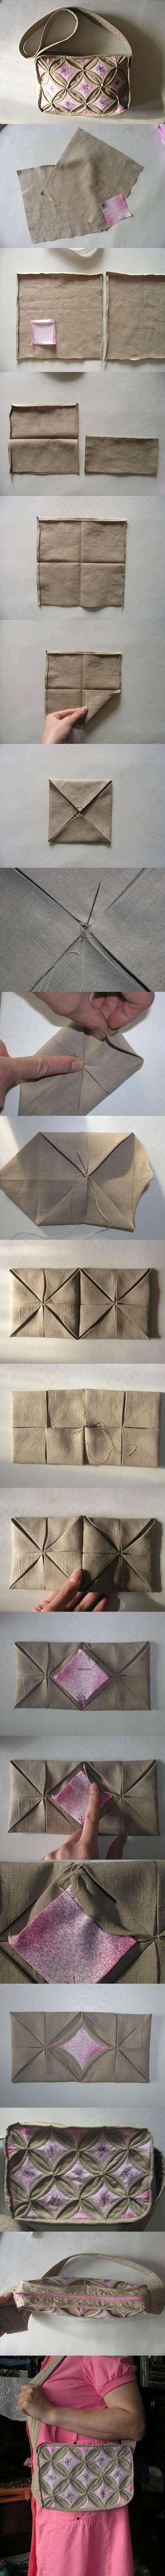 How to make an origami handbag fashion diy diy crafts do it yourself diy projects diy fashion origami